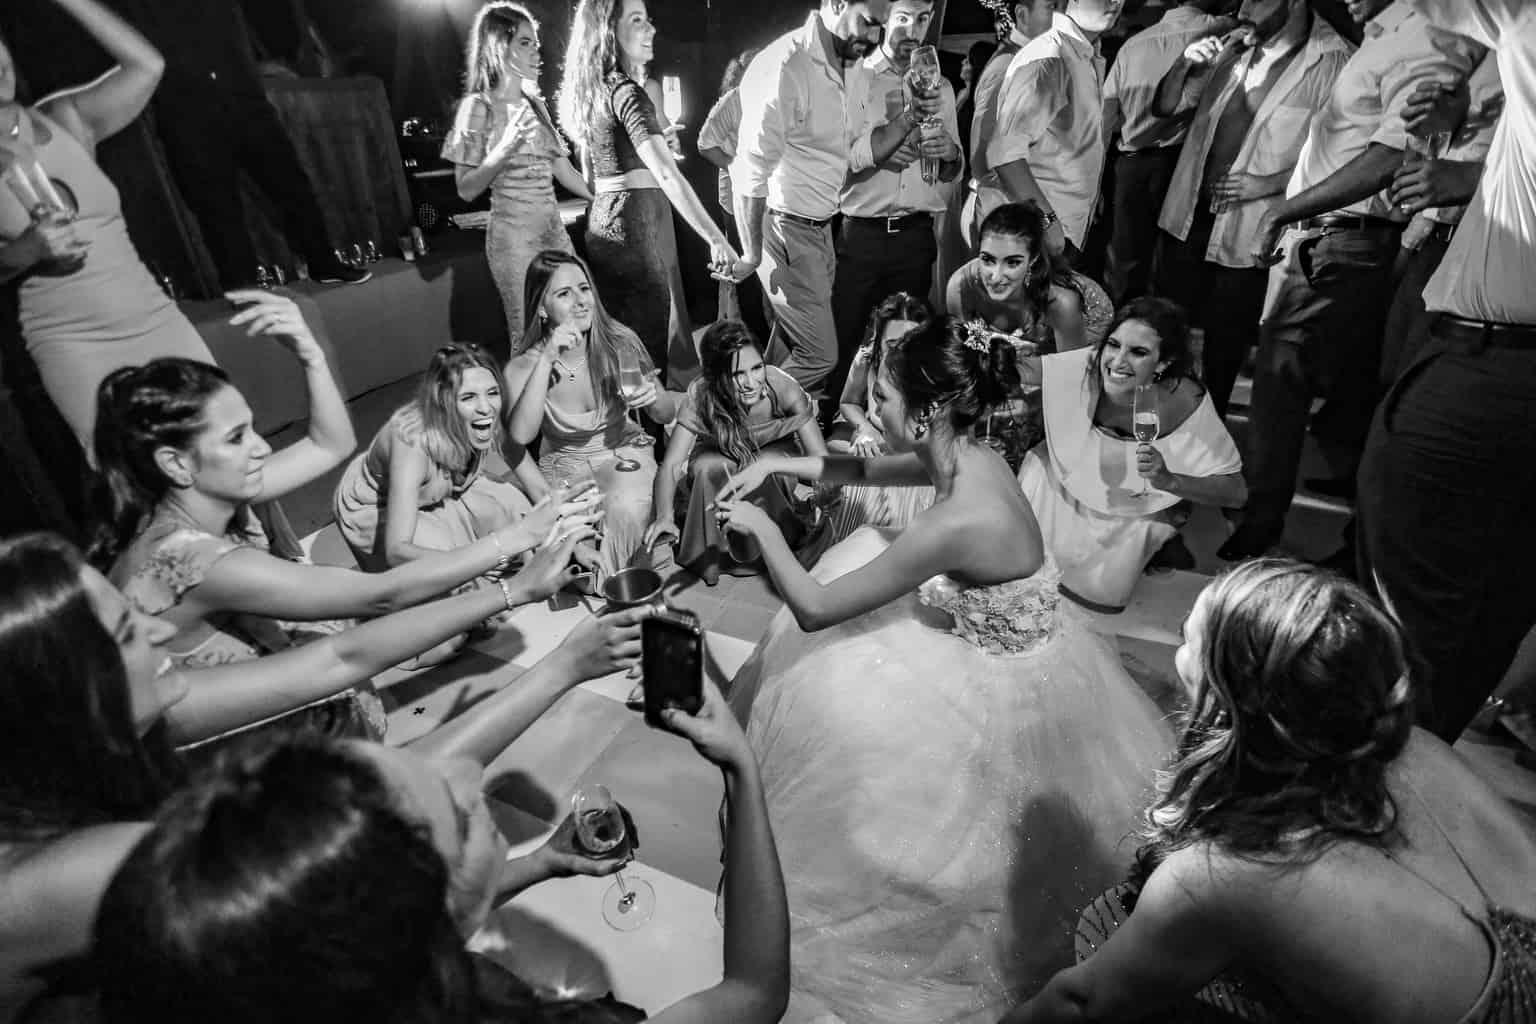 Casamento-Alissa-e-Gustavo-Cerimonial-Manu-Goncalez-Decor-Andrea-Kapps-Fasano-Angra-dos-Reis-Foto-VRebel-DJ-Jimmy-festa5801